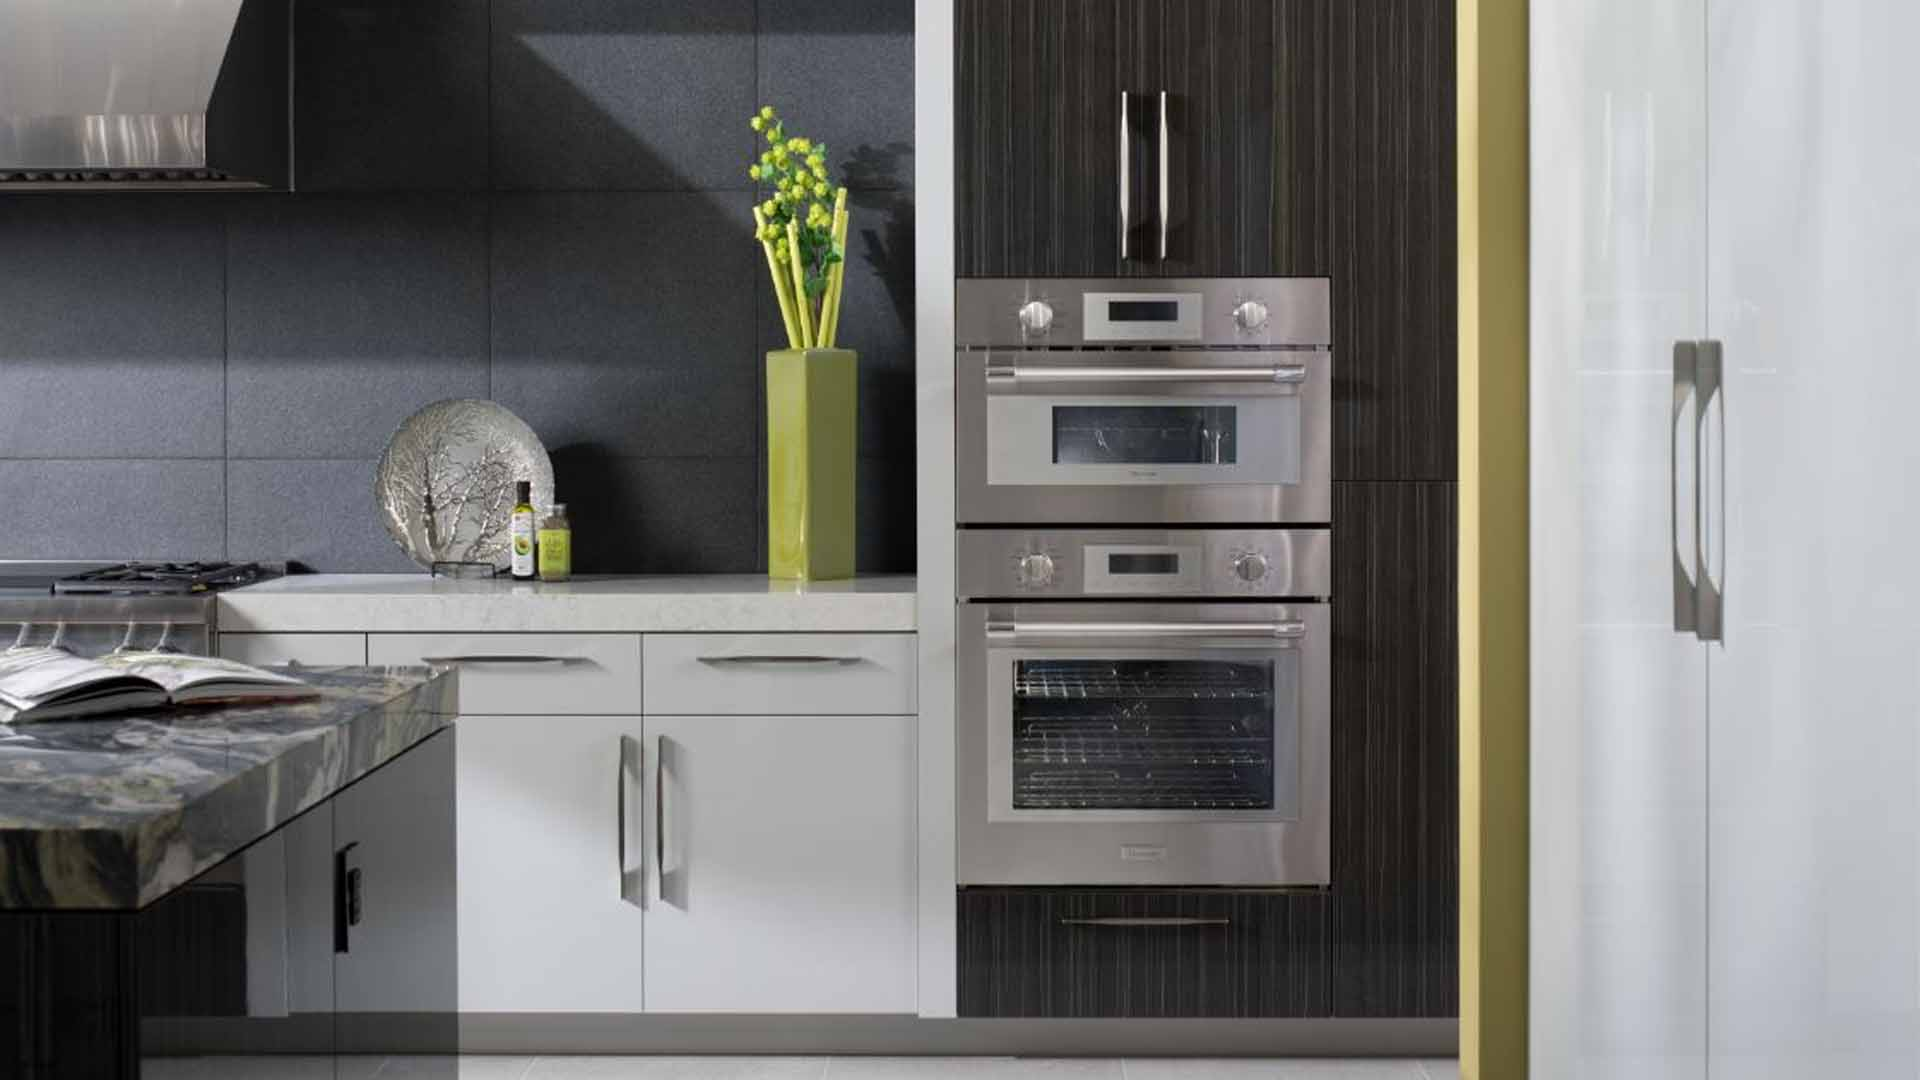 Thermador Appliance Repair Service Phoenix | Thermador Appliance Repair Pros